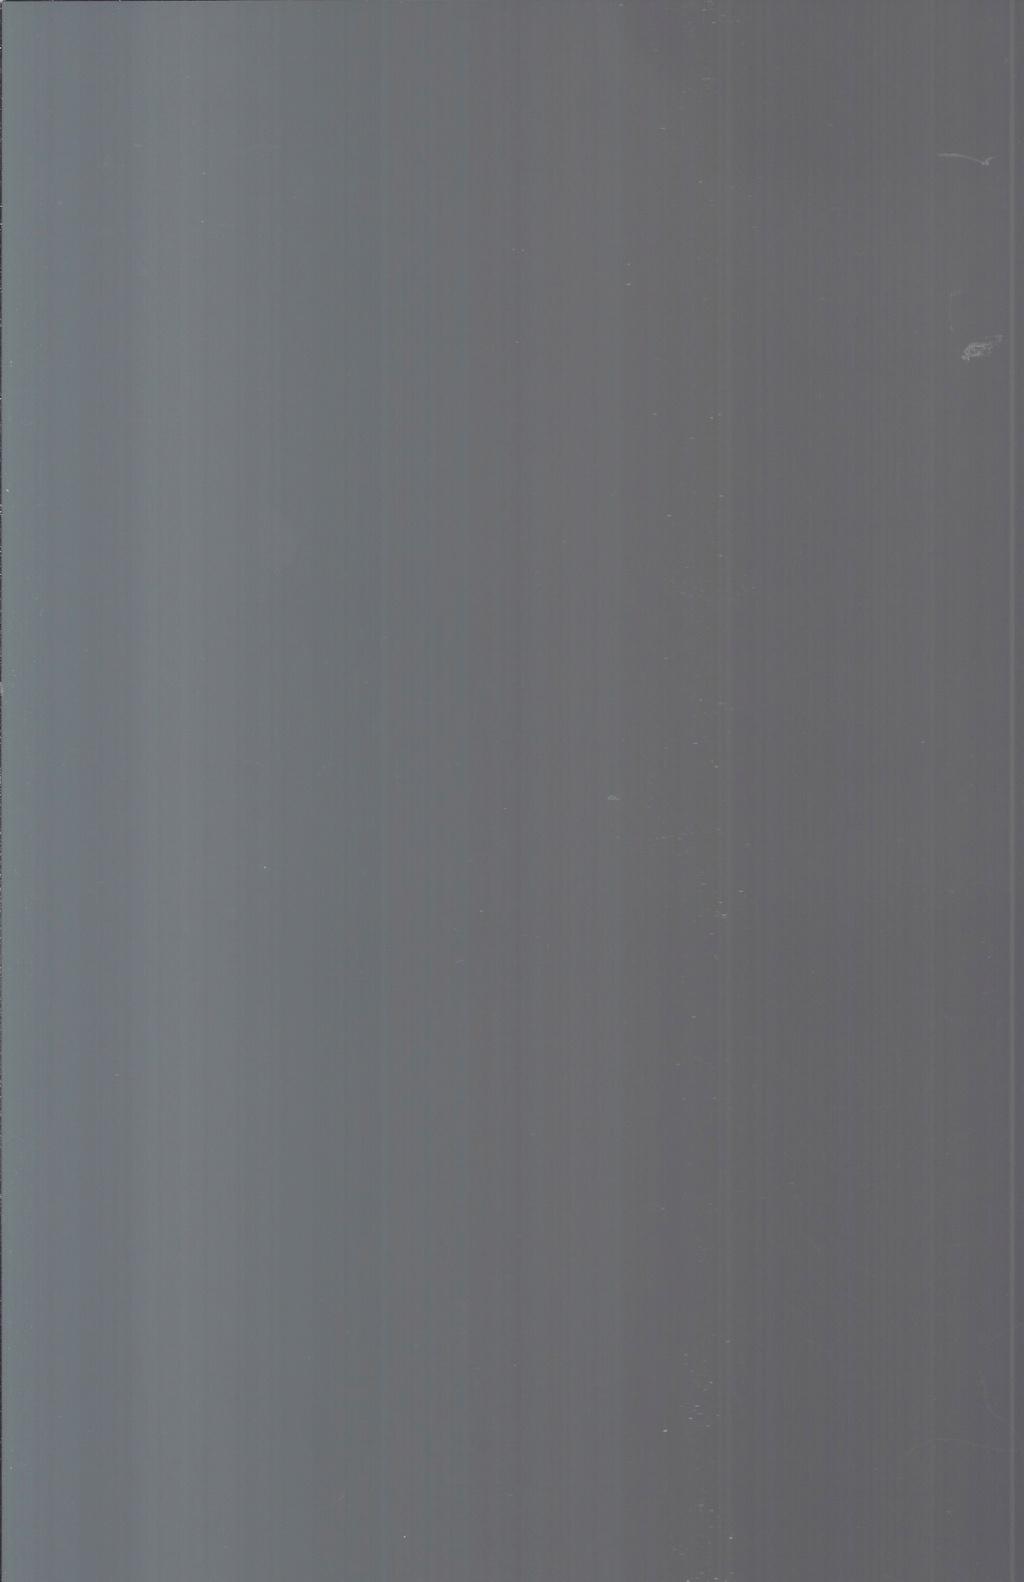 [AIRFIX 2013] Catalogue 2013 Airf1451